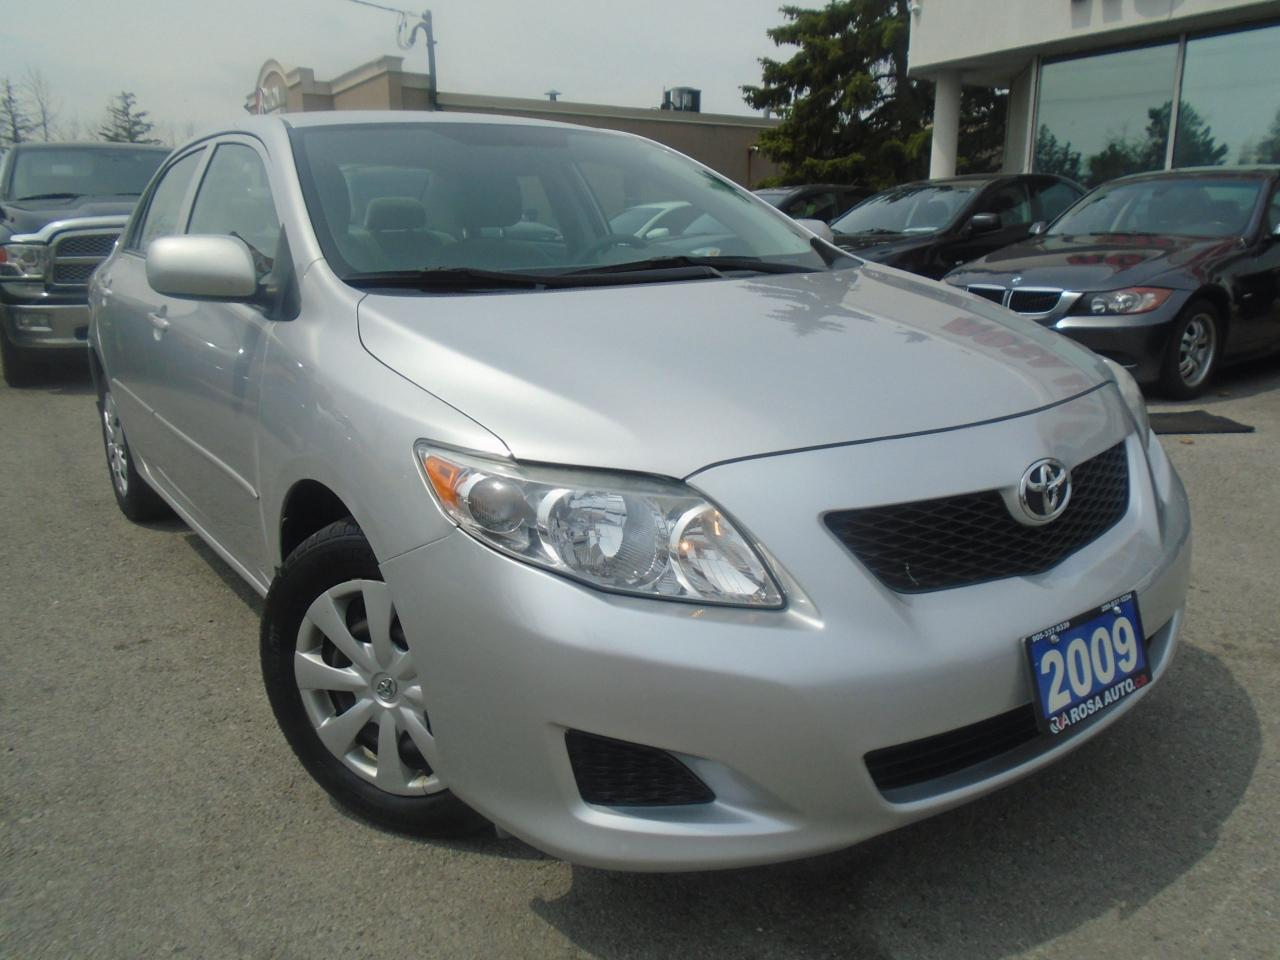 2009 Toyota Corolla AUTO LOW KM 1 OWNER PW PL PM CRUISE SAFETY KEYLESS